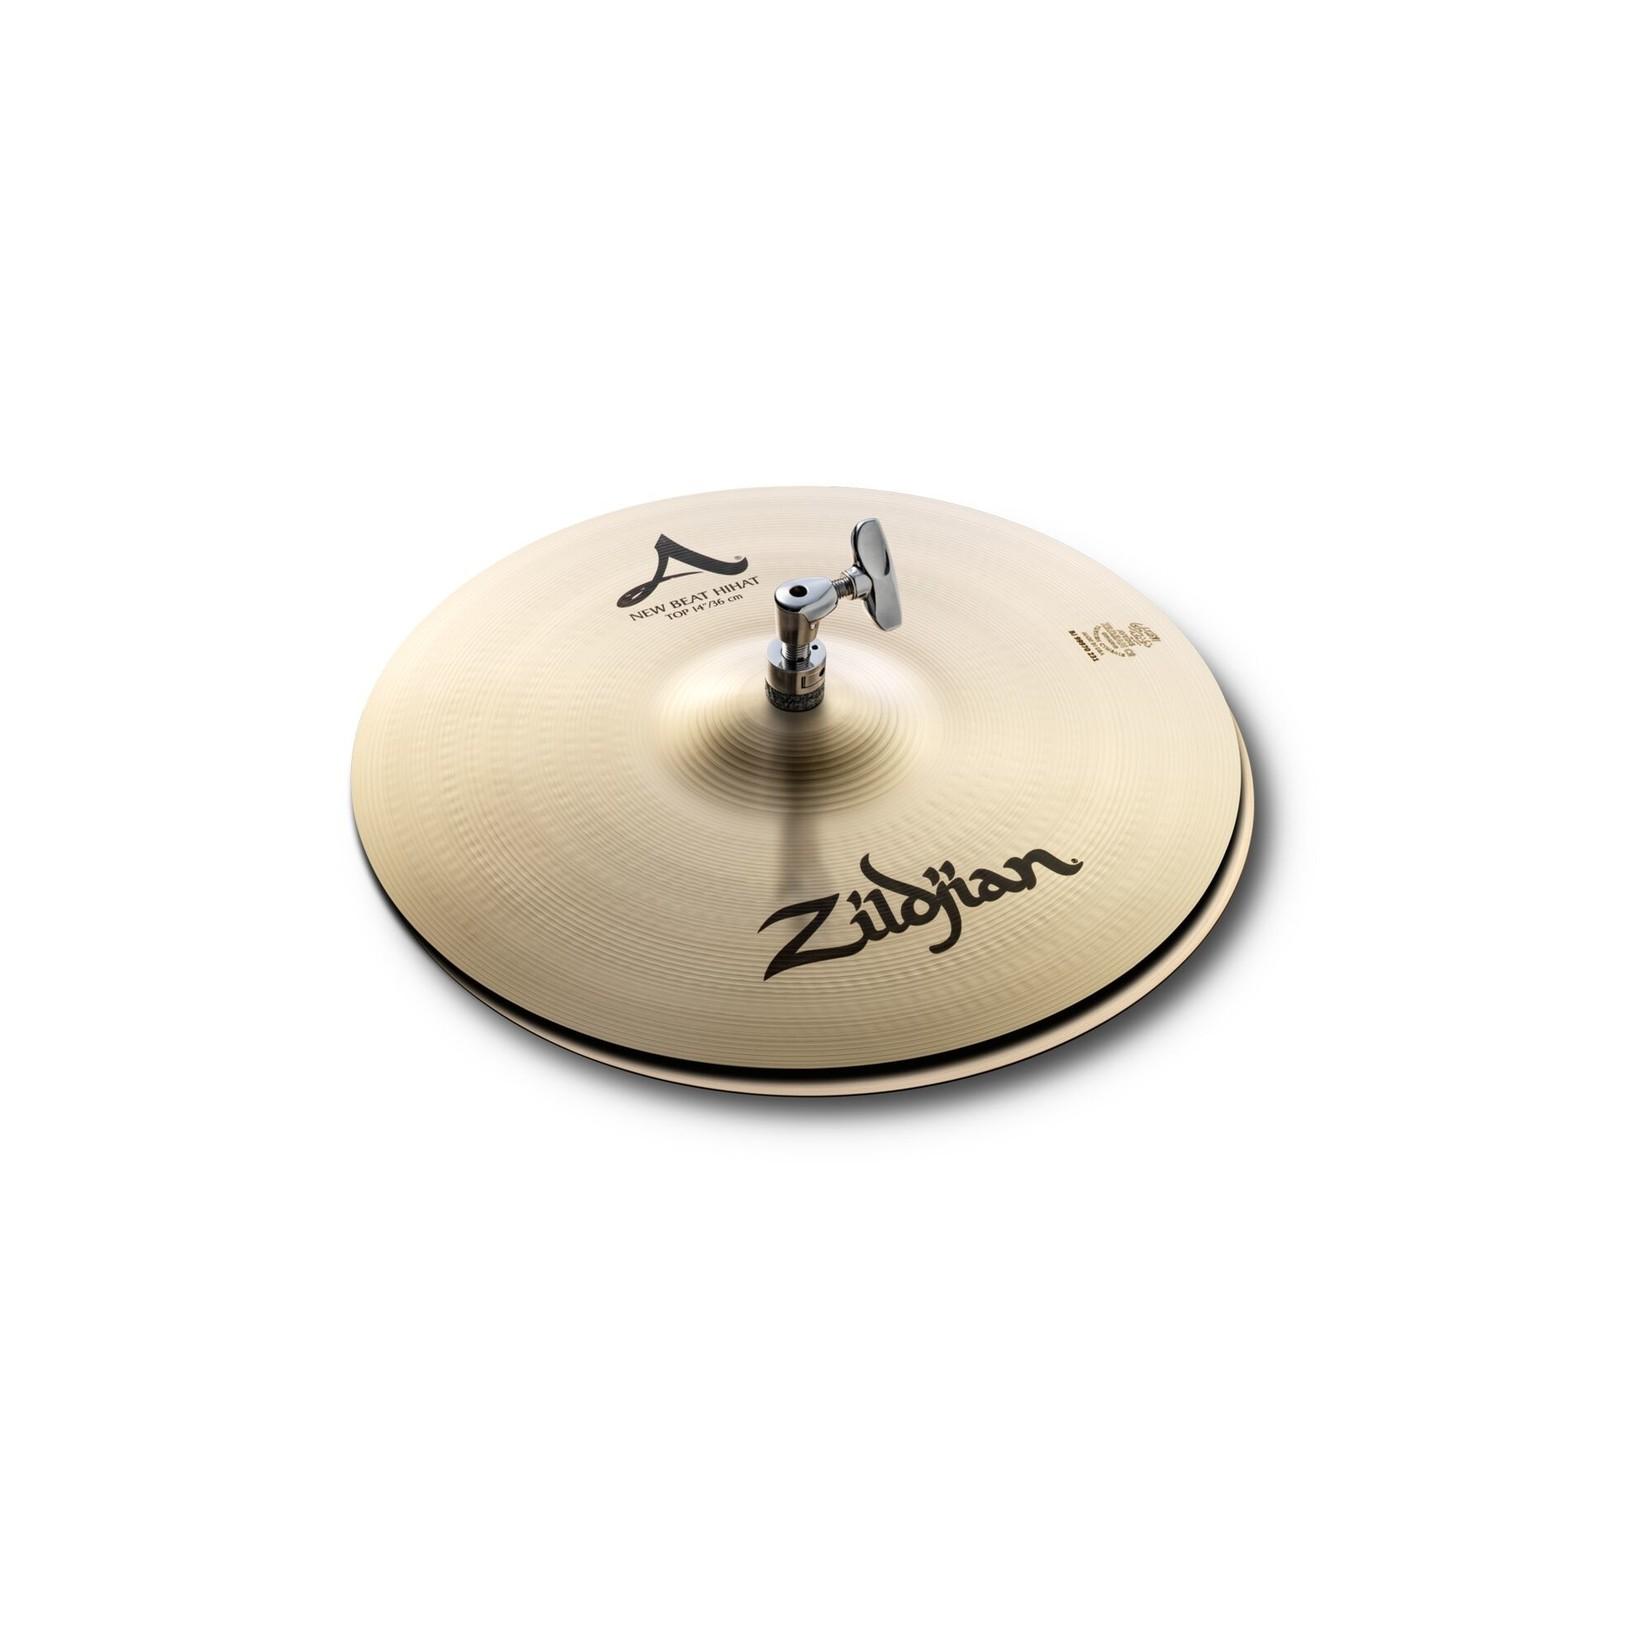 Zildjian Zildjian 14'' A Zildjian New Beat HiHats - Pair